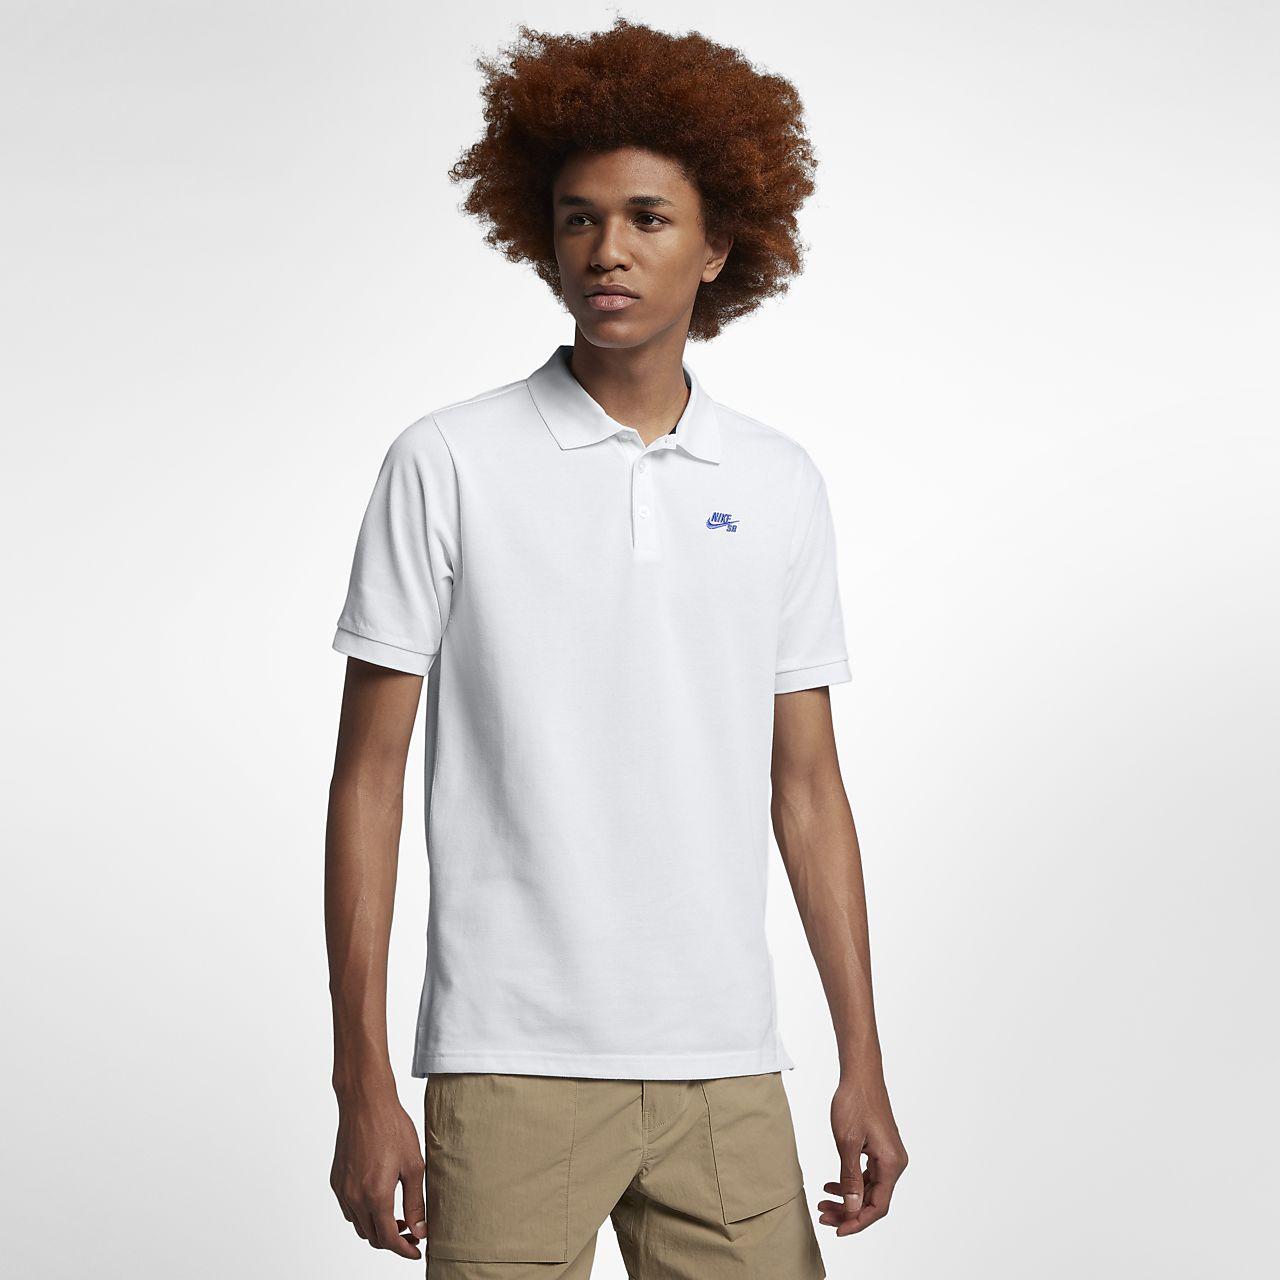 Nike SB Dri FIT Pique Men's Polo